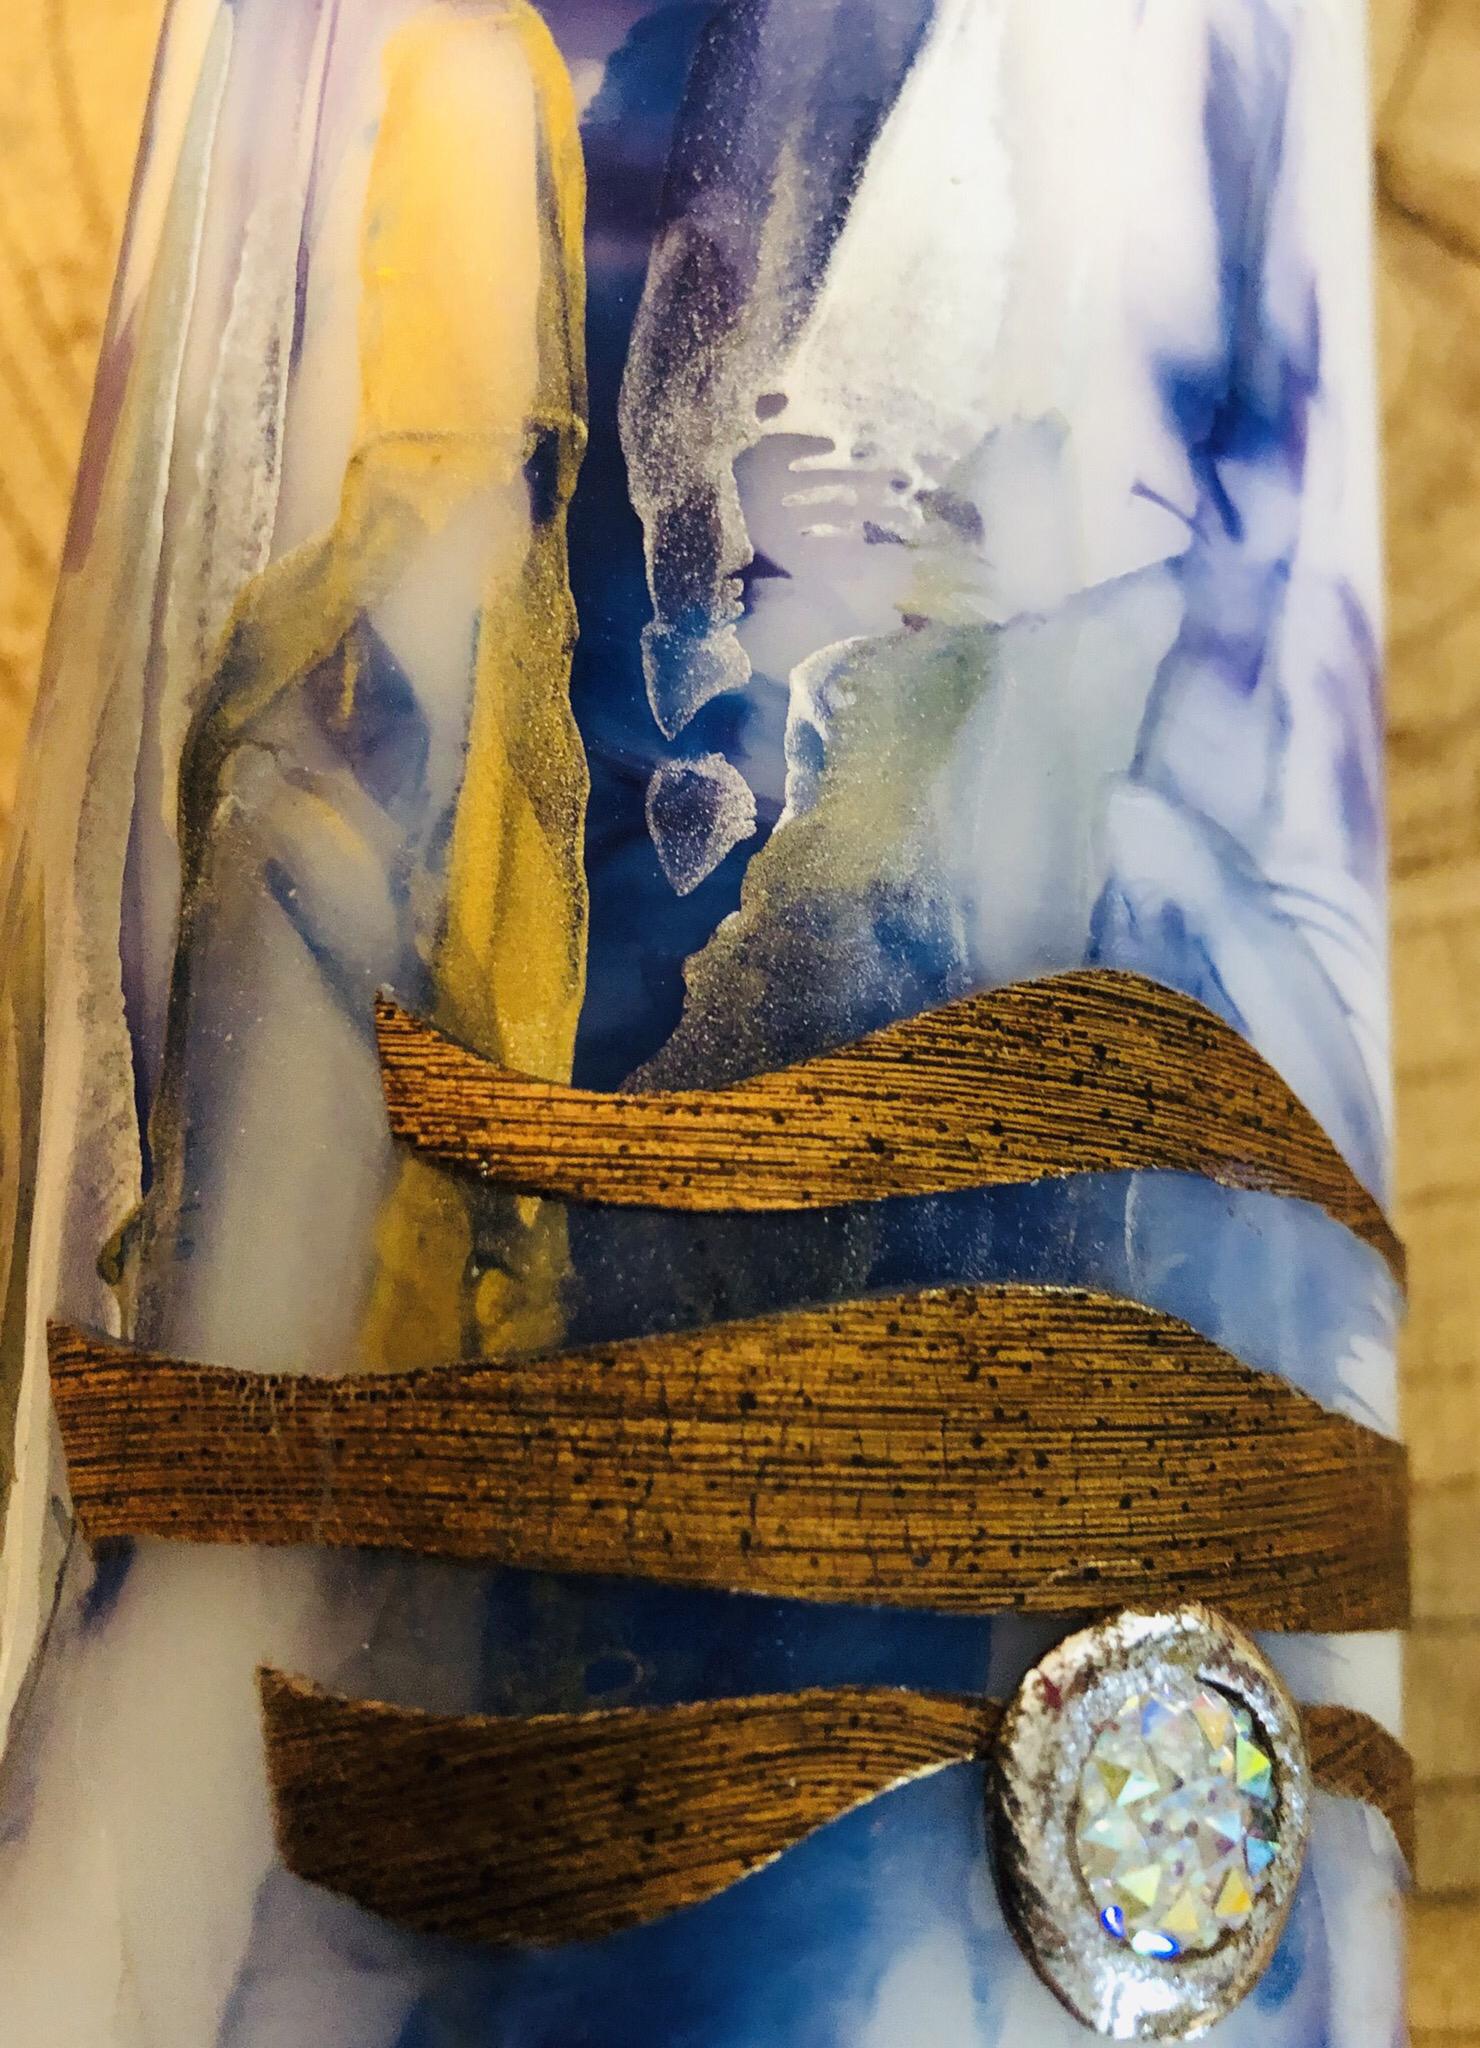 Kerze Encaustic Blau/Goldtöne - Perlen und Swarovskikristalle